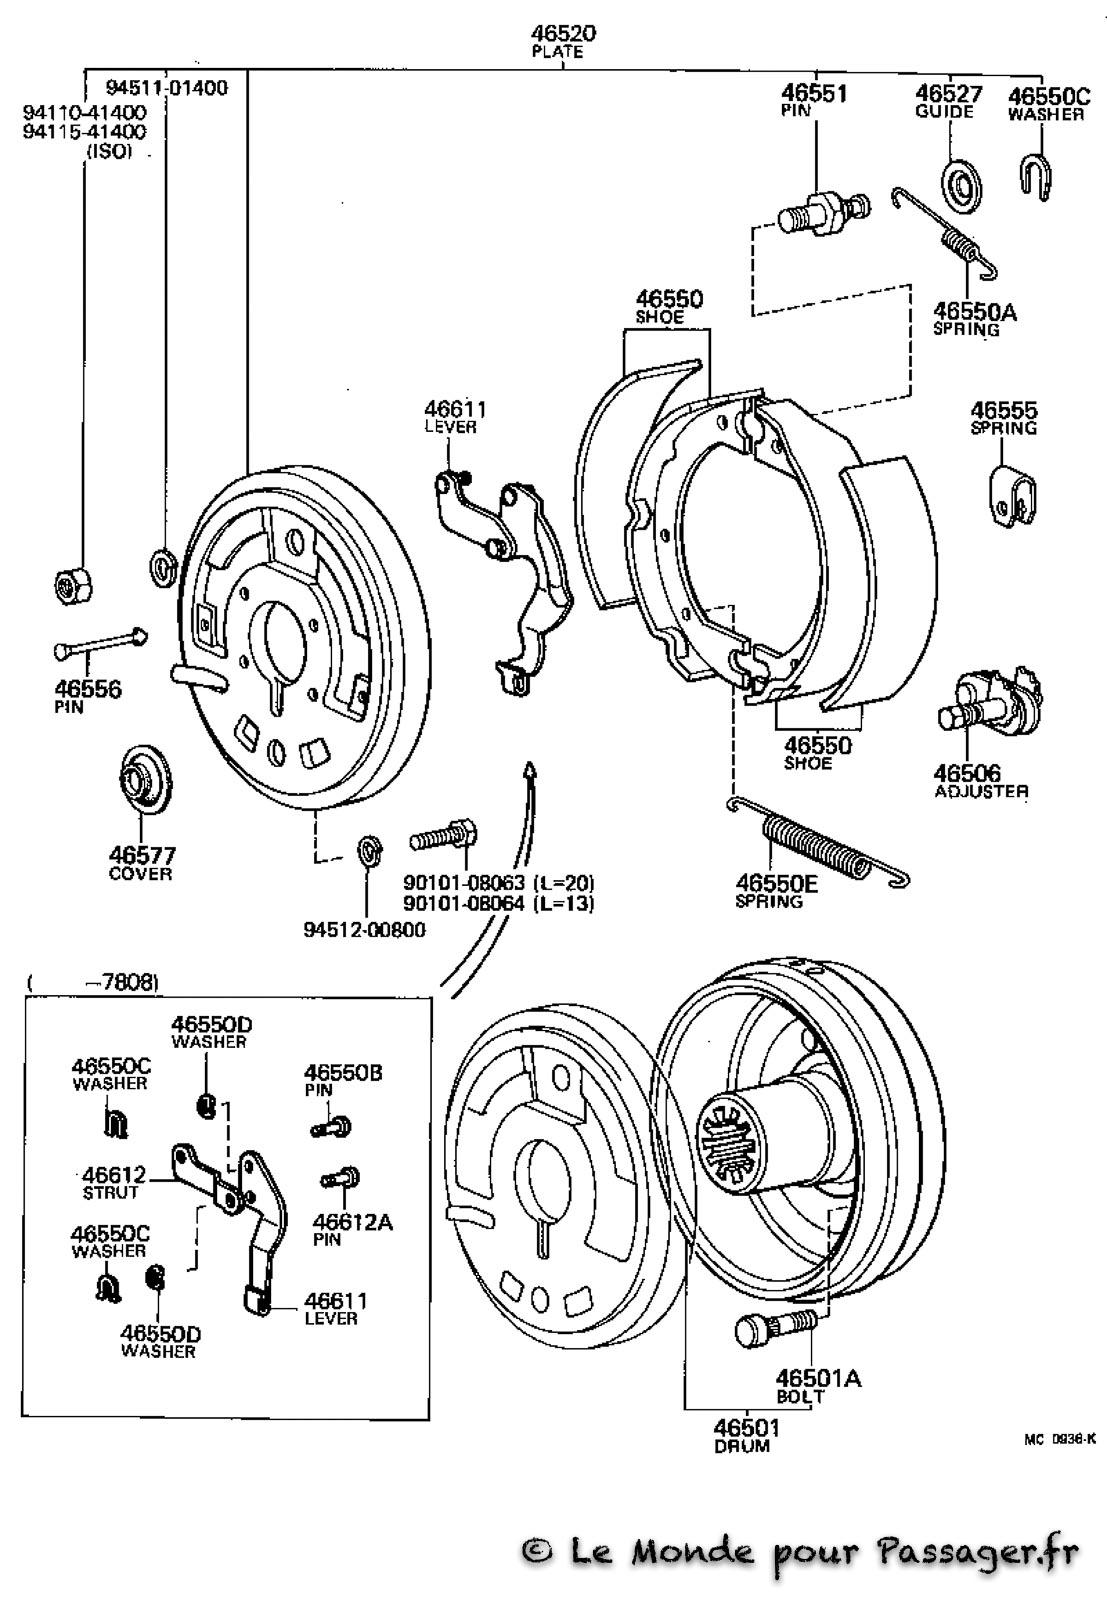 Fj55-Eclatés-Techniques124